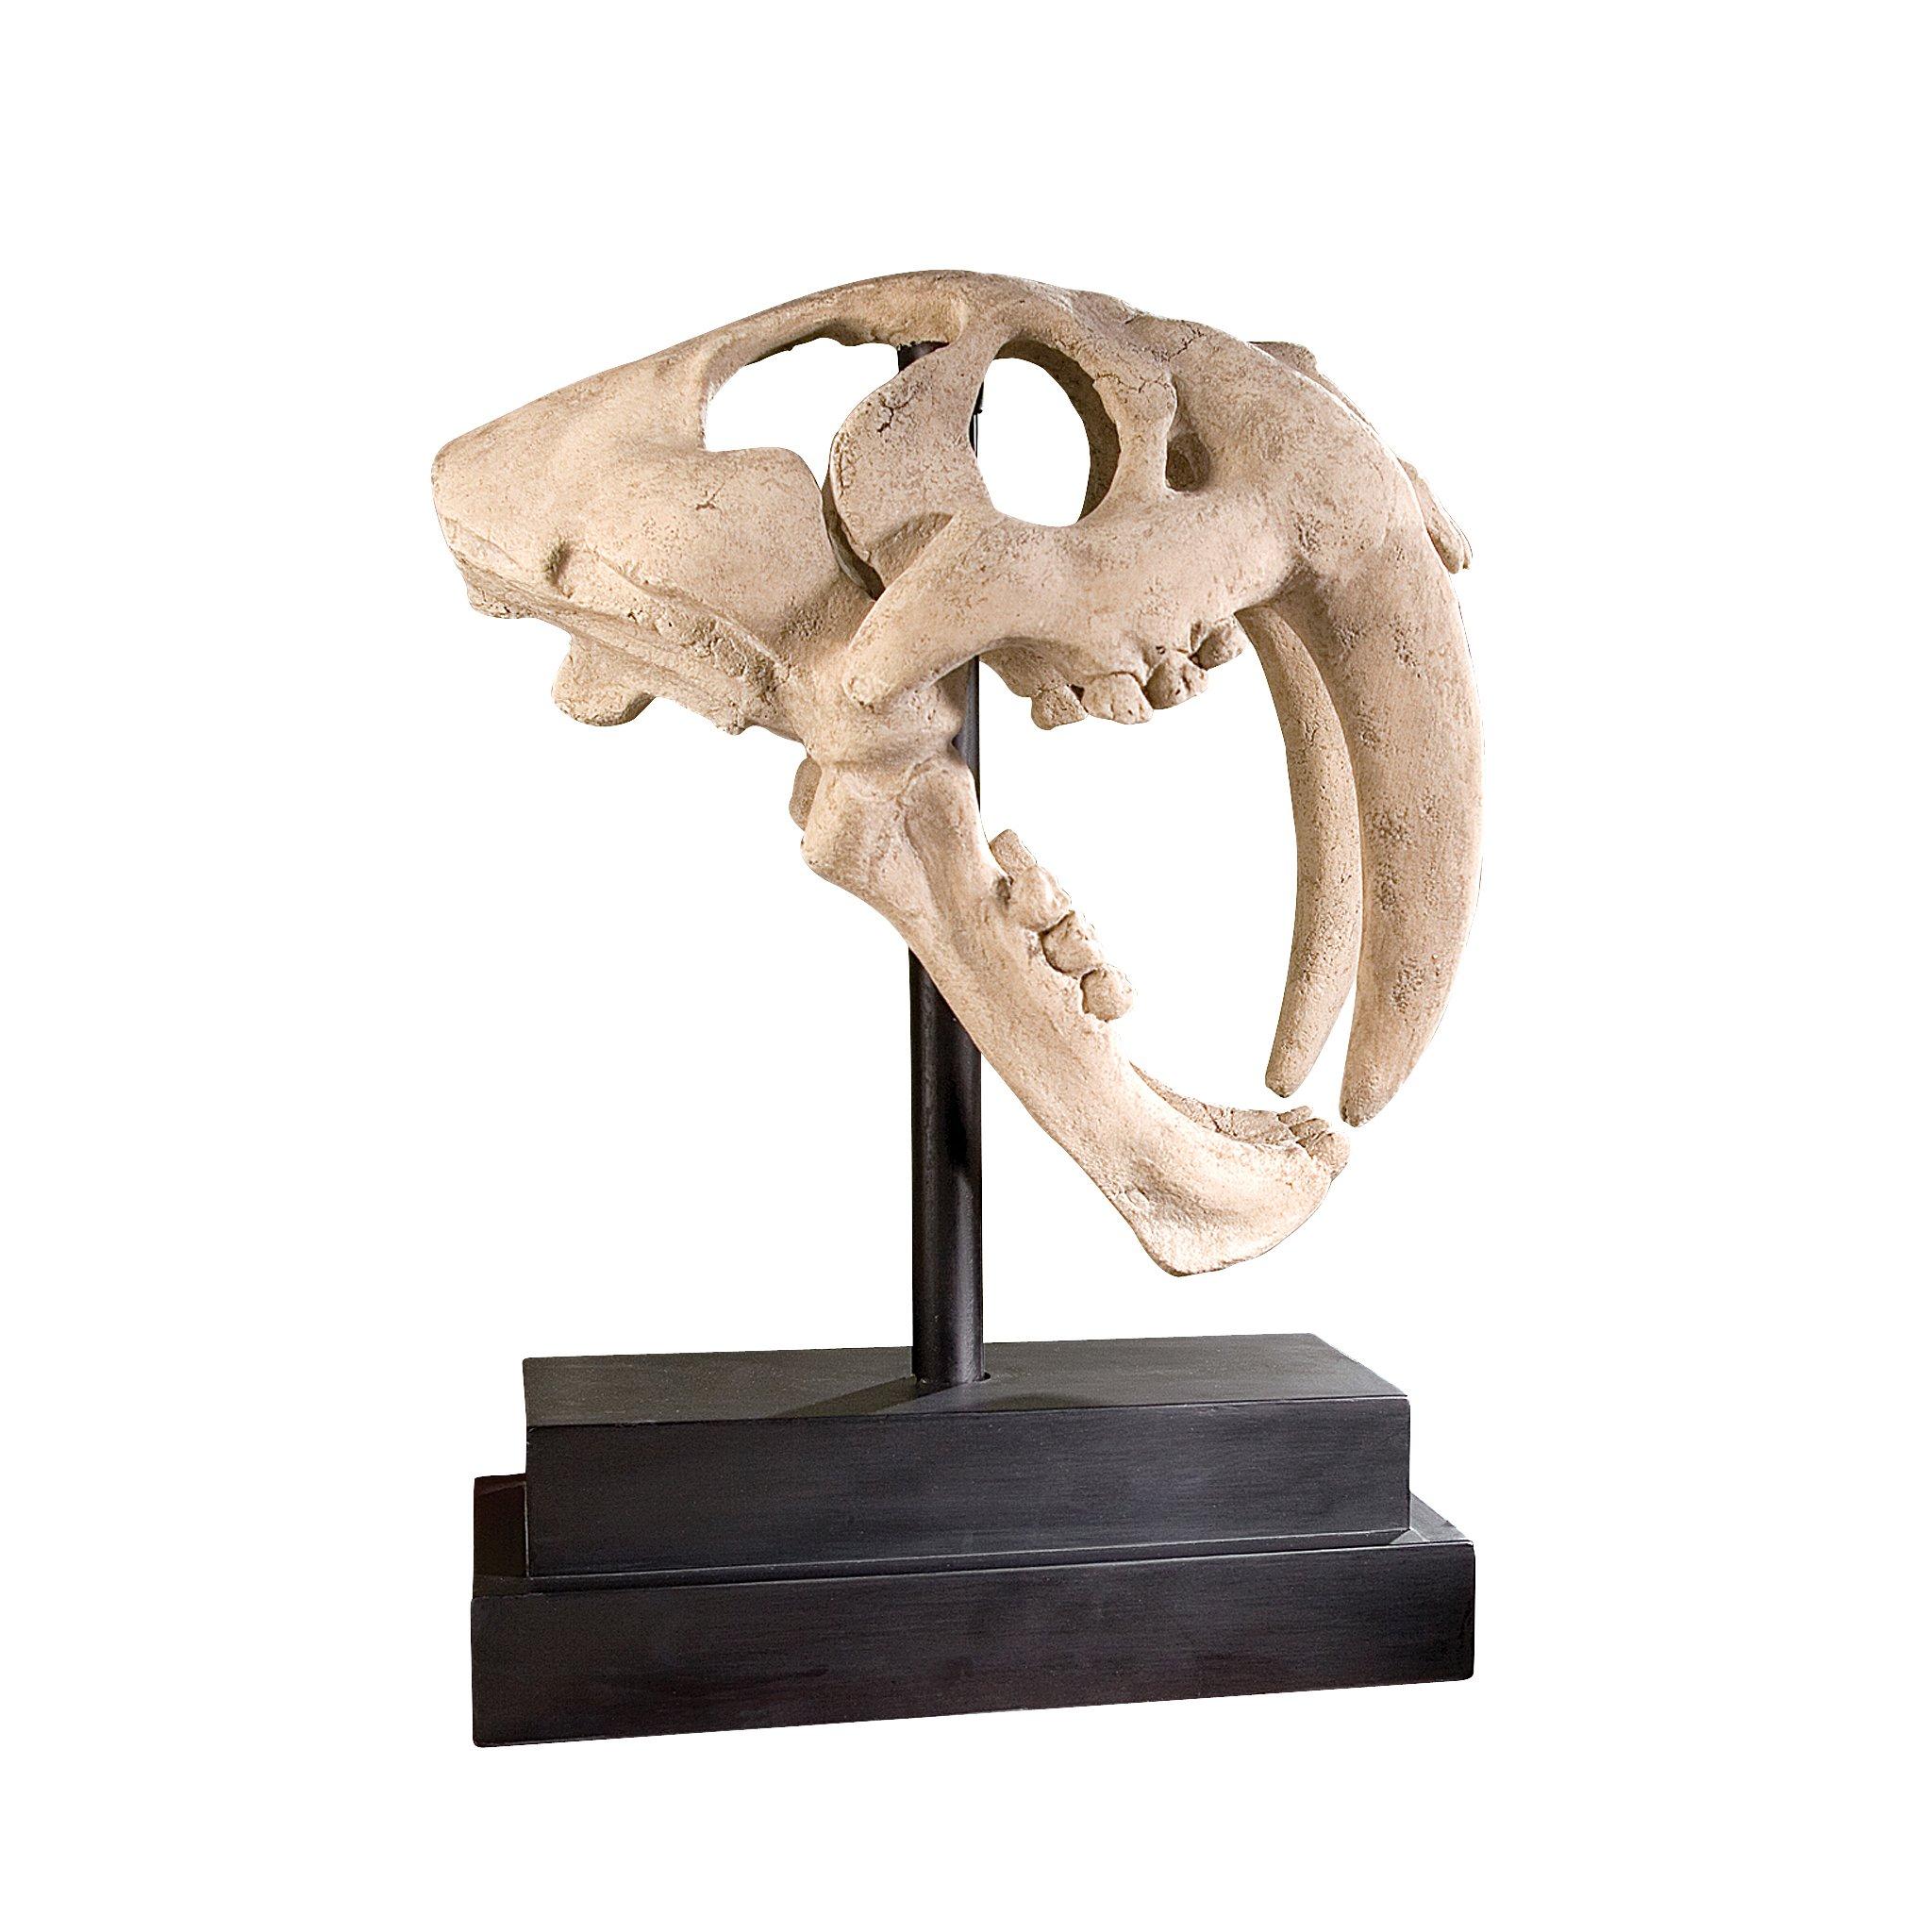 Design Toscano Inc 20.5H in. Saber-toothed Tiger Skull Artifact